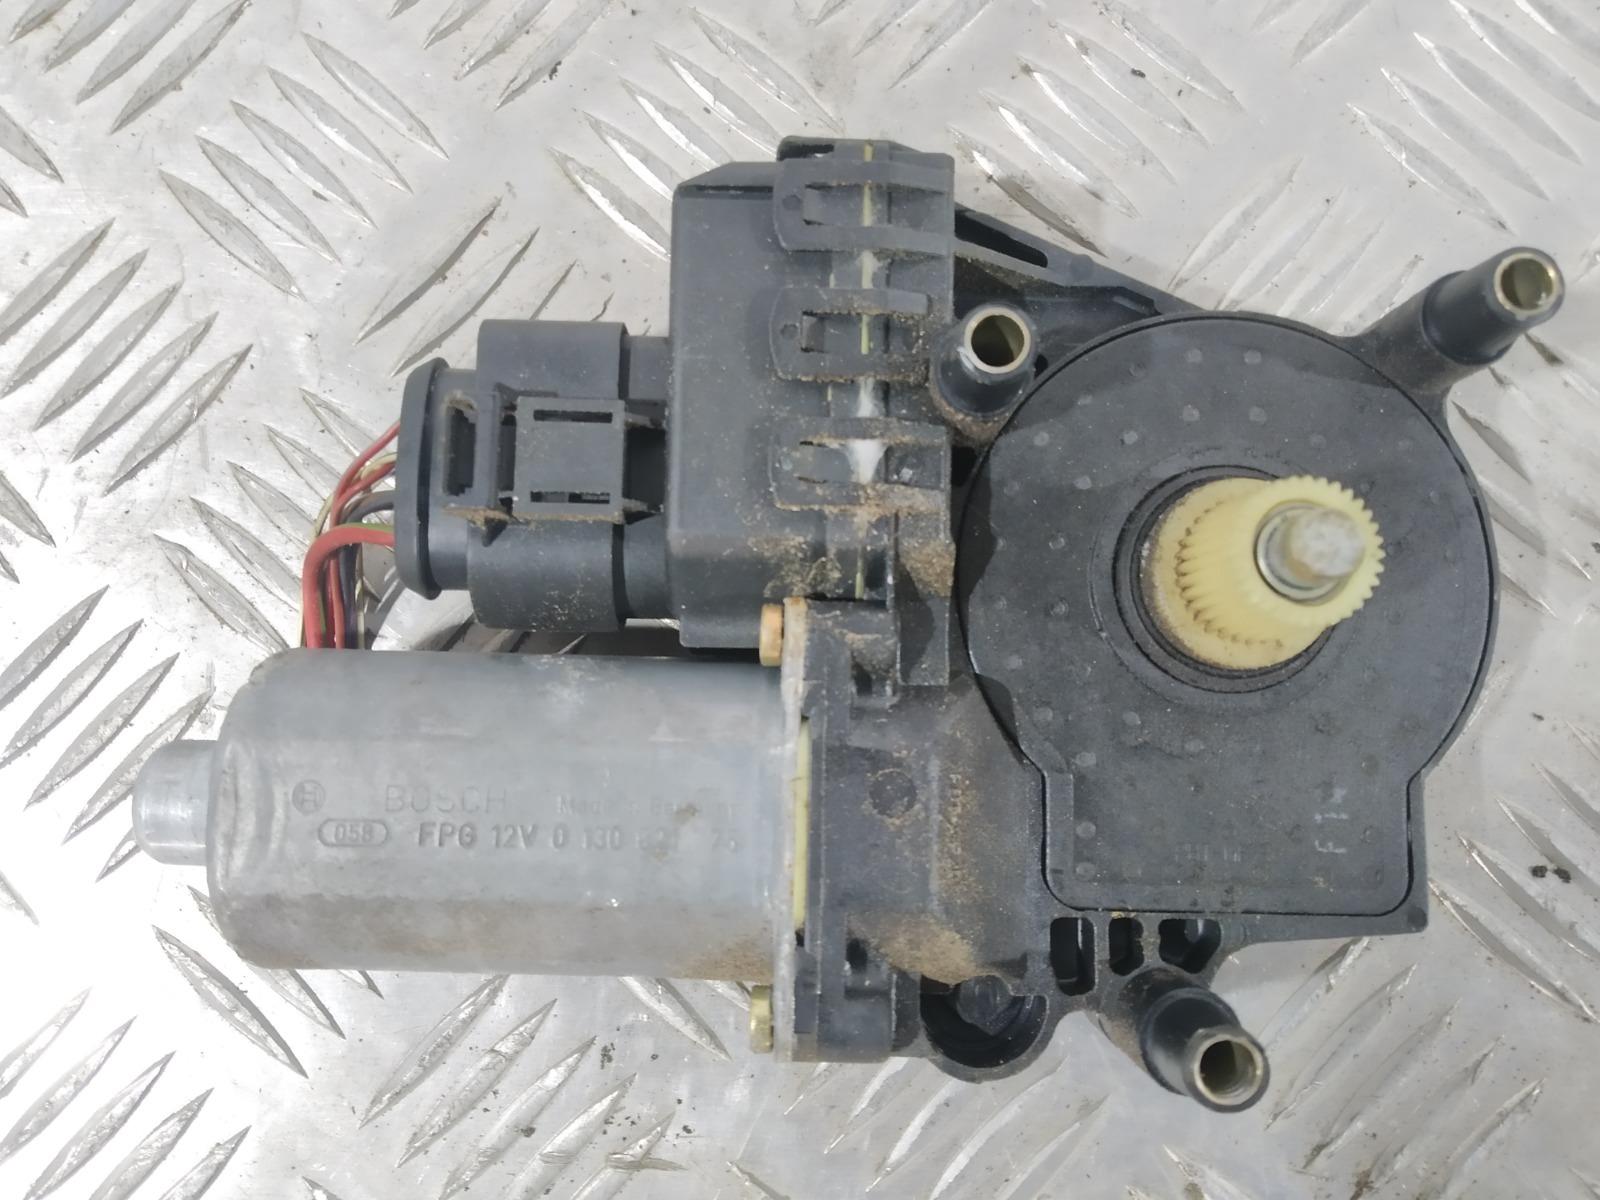 Моторчик стеклоподъемника передний левый Audi A6 C5 2.5 TDI 2003 (б/у)